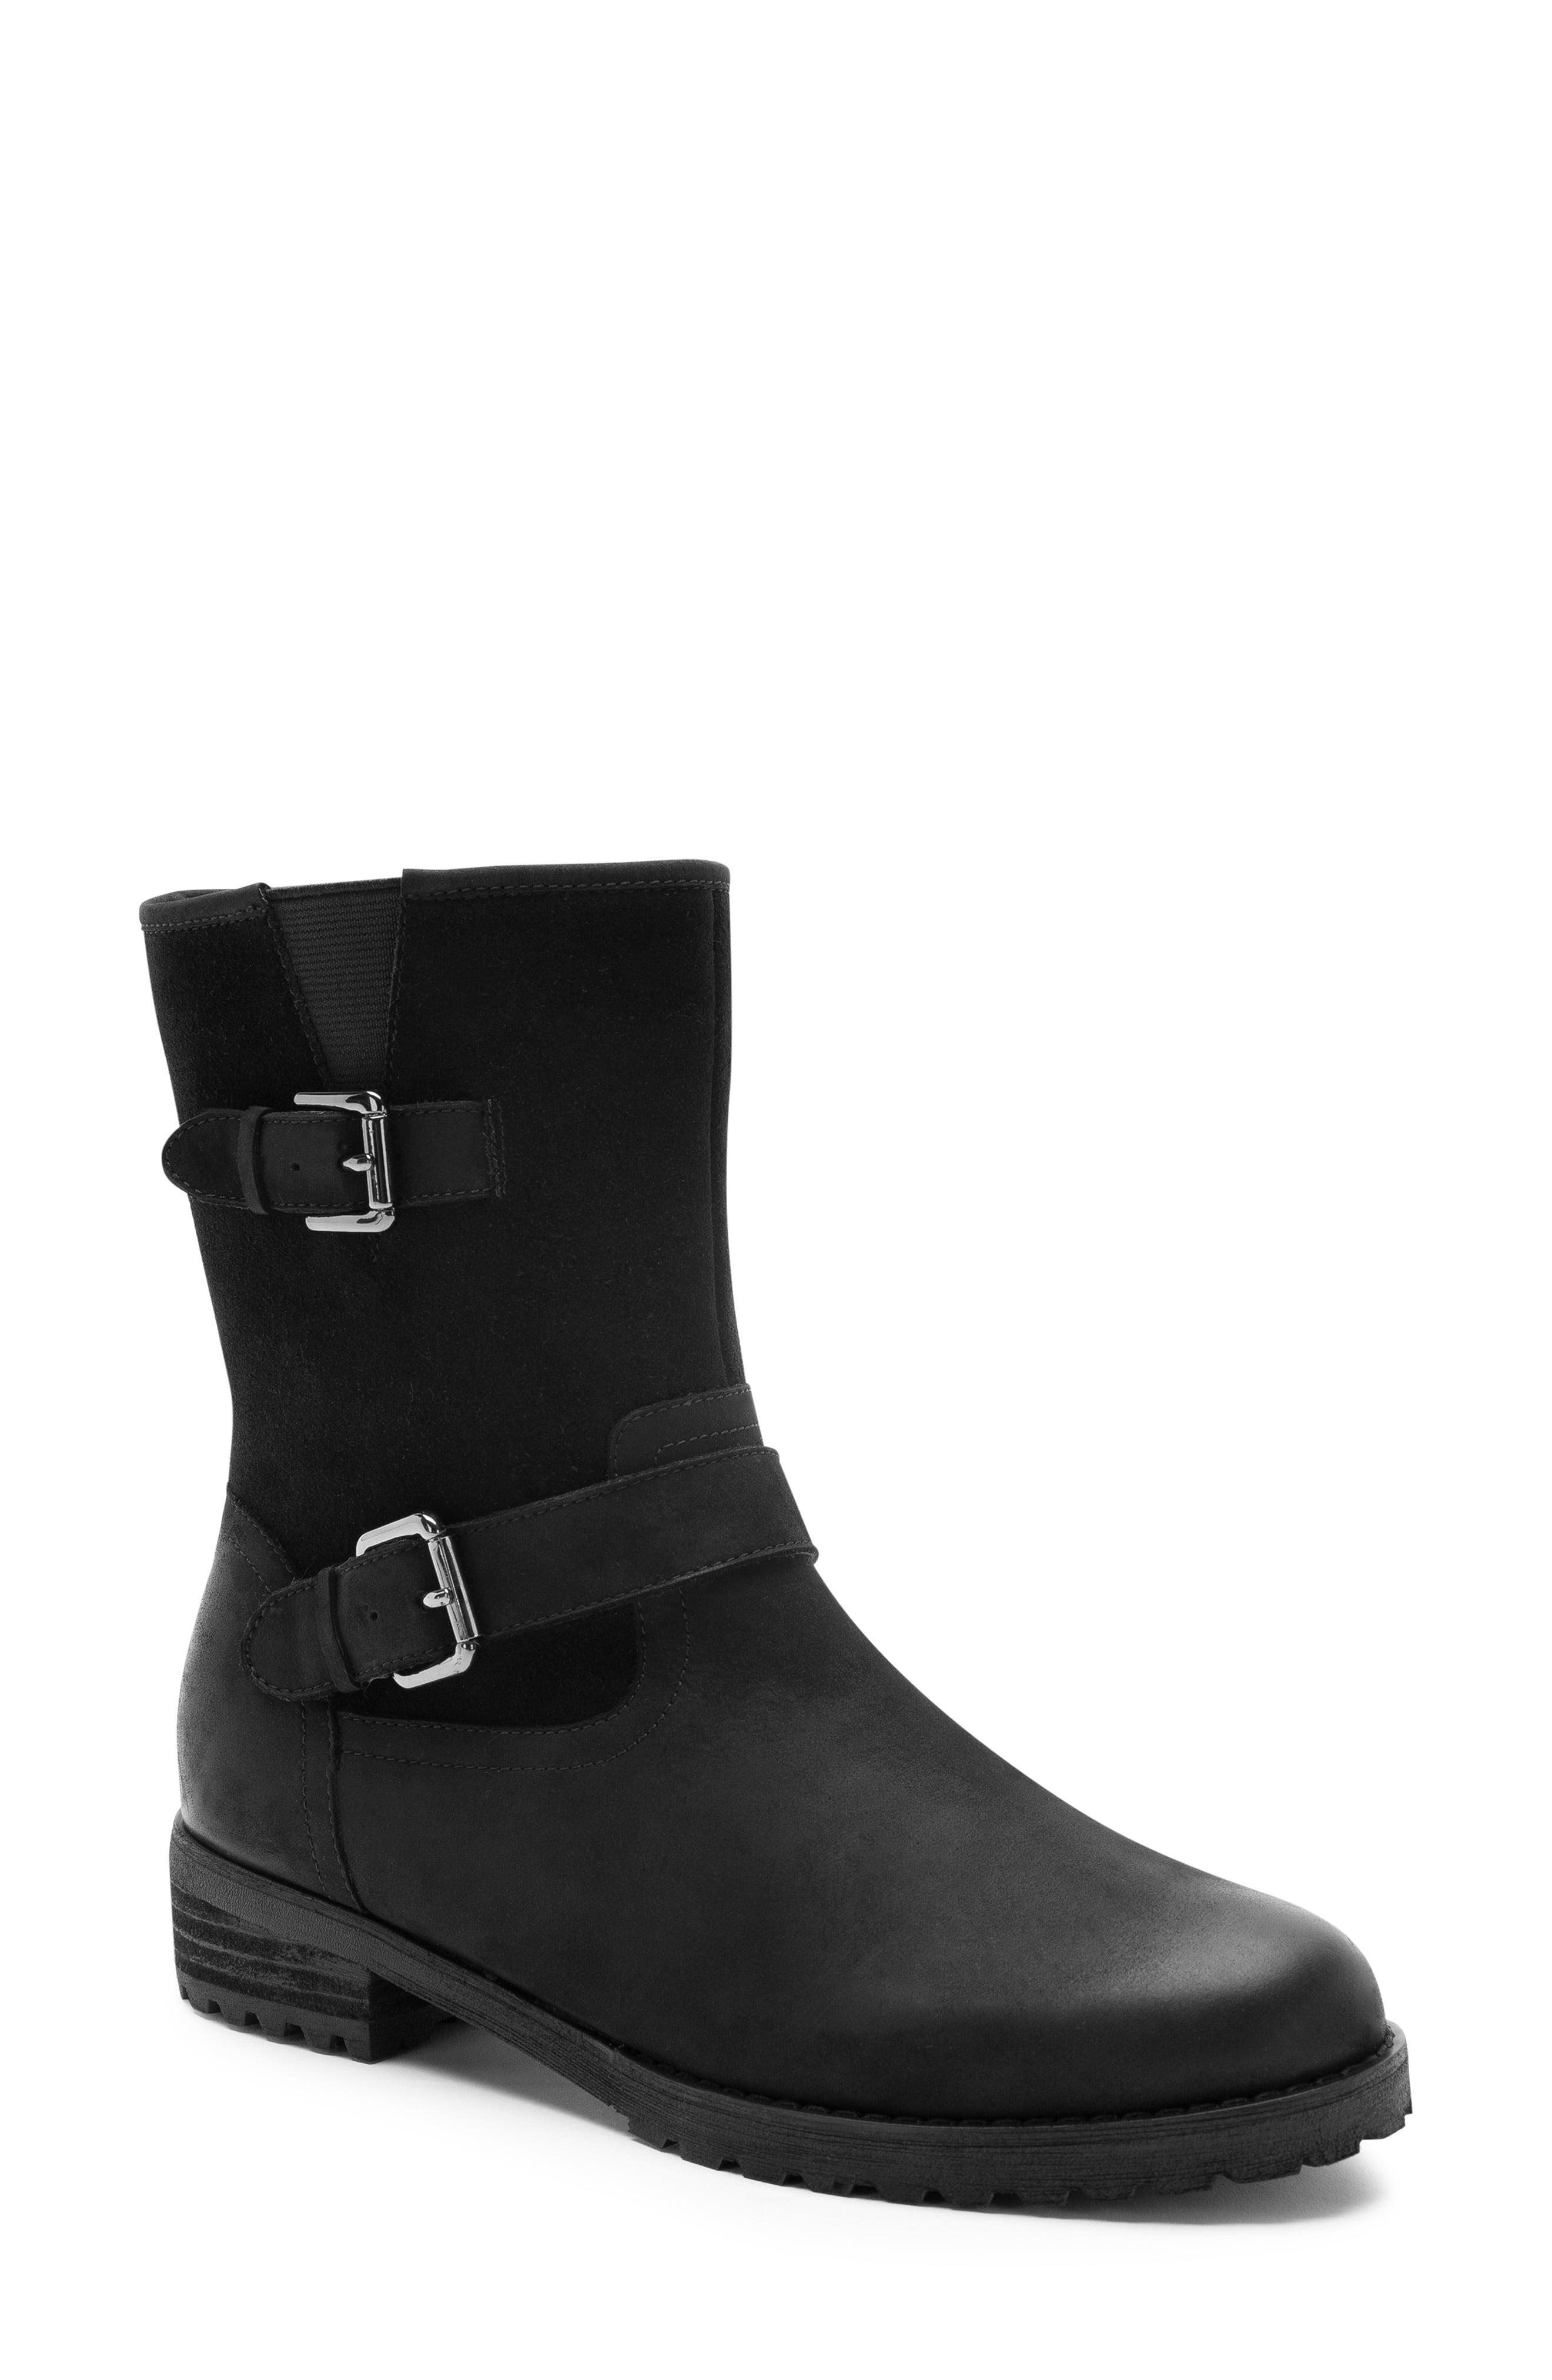 7155b80f25e Lyst - Blondo Val Waterproof Boot in Black - Save 13%